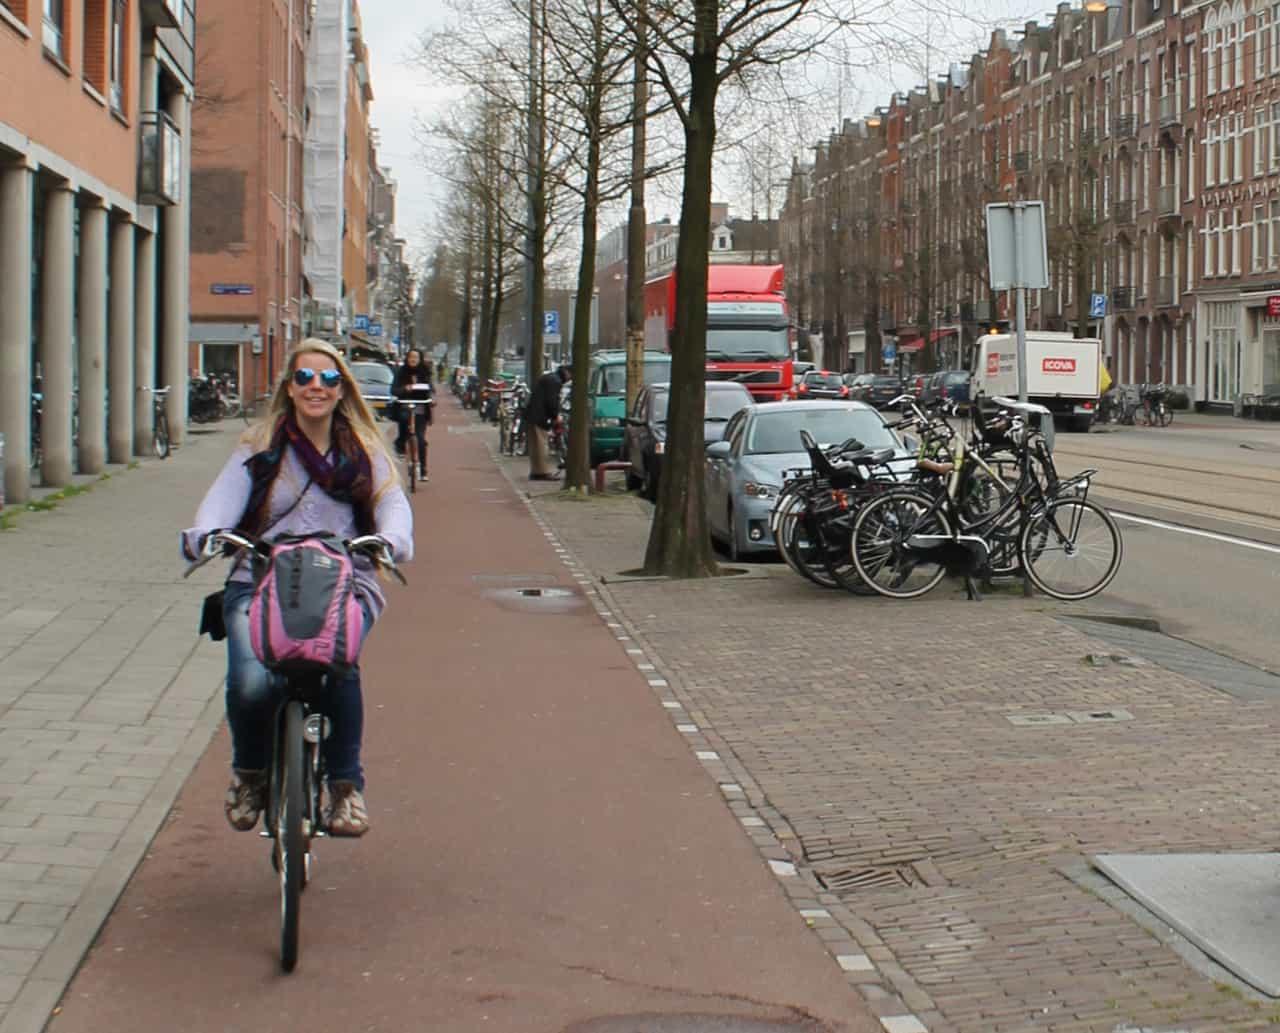 My friend Toni, loving the freedom of biking in Amsterdam